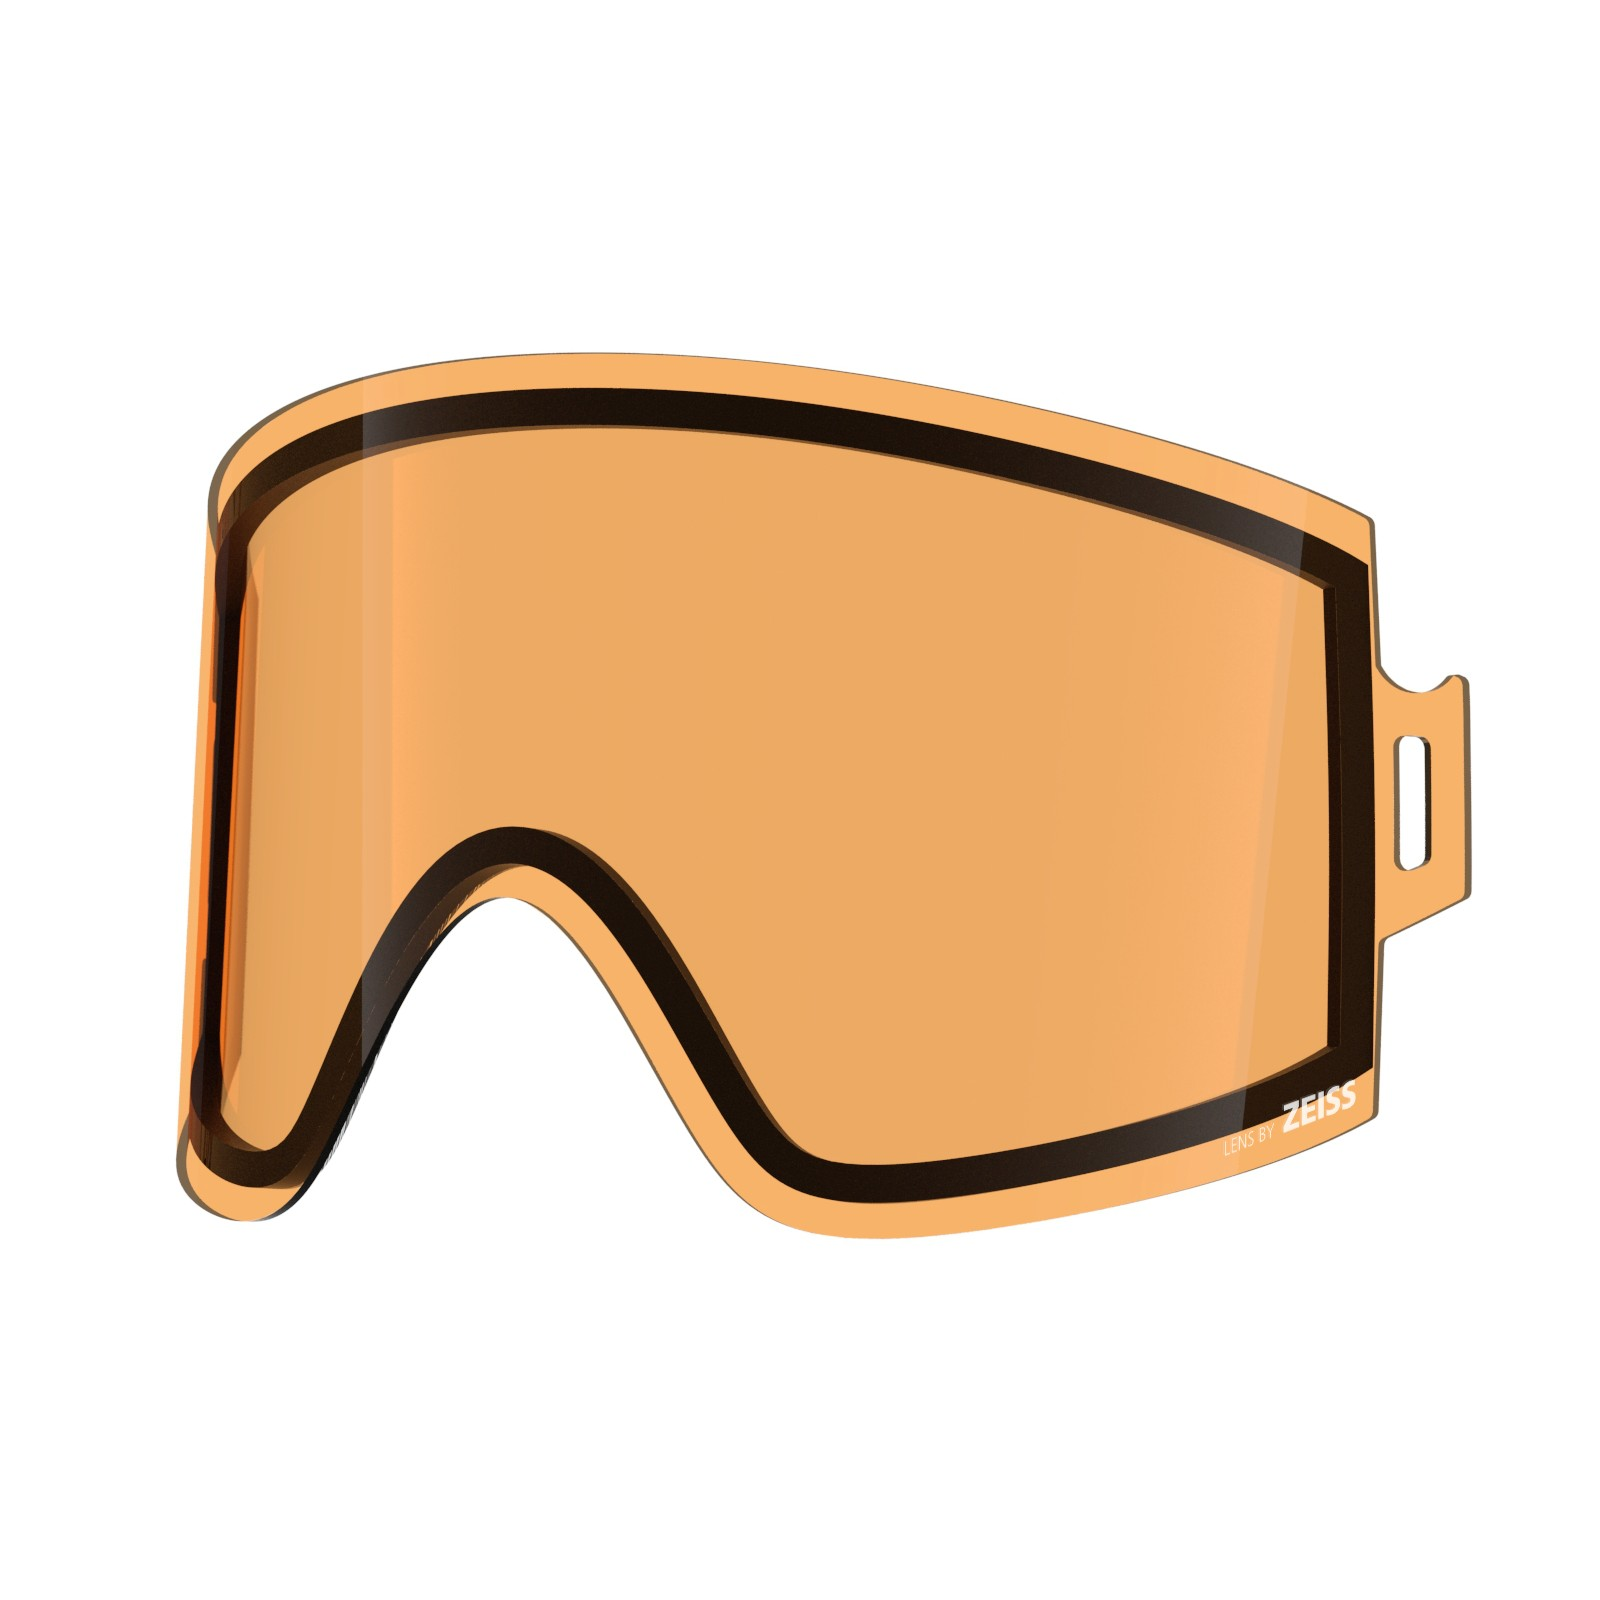 PERSIMMON lens for  Katana goggle